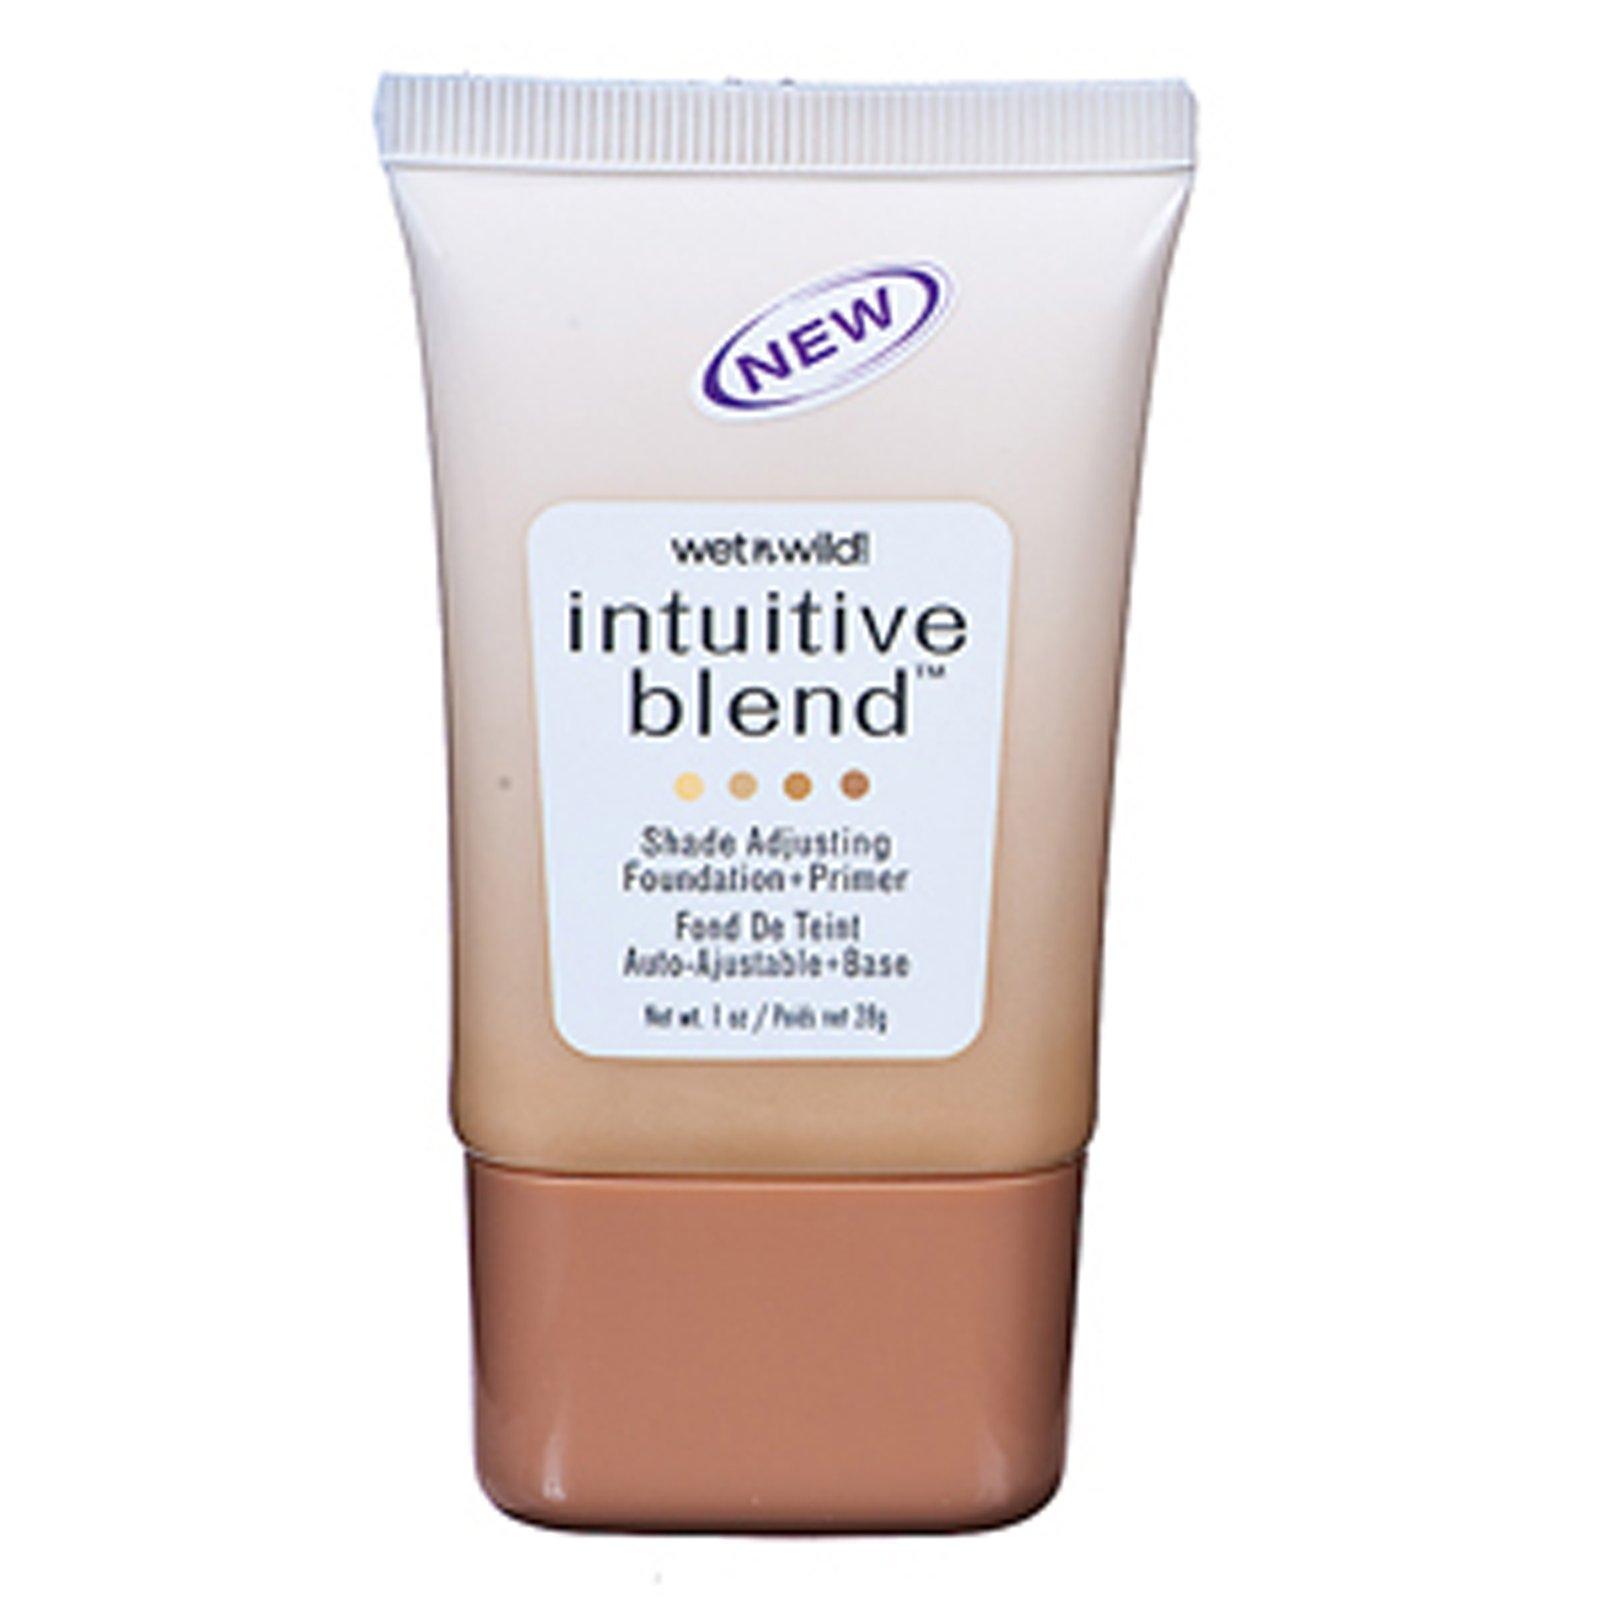 null - Wet n Wild Intuitive Blend Foundation + Primer, Shade Adjusting, Tan 178, 1 oz.